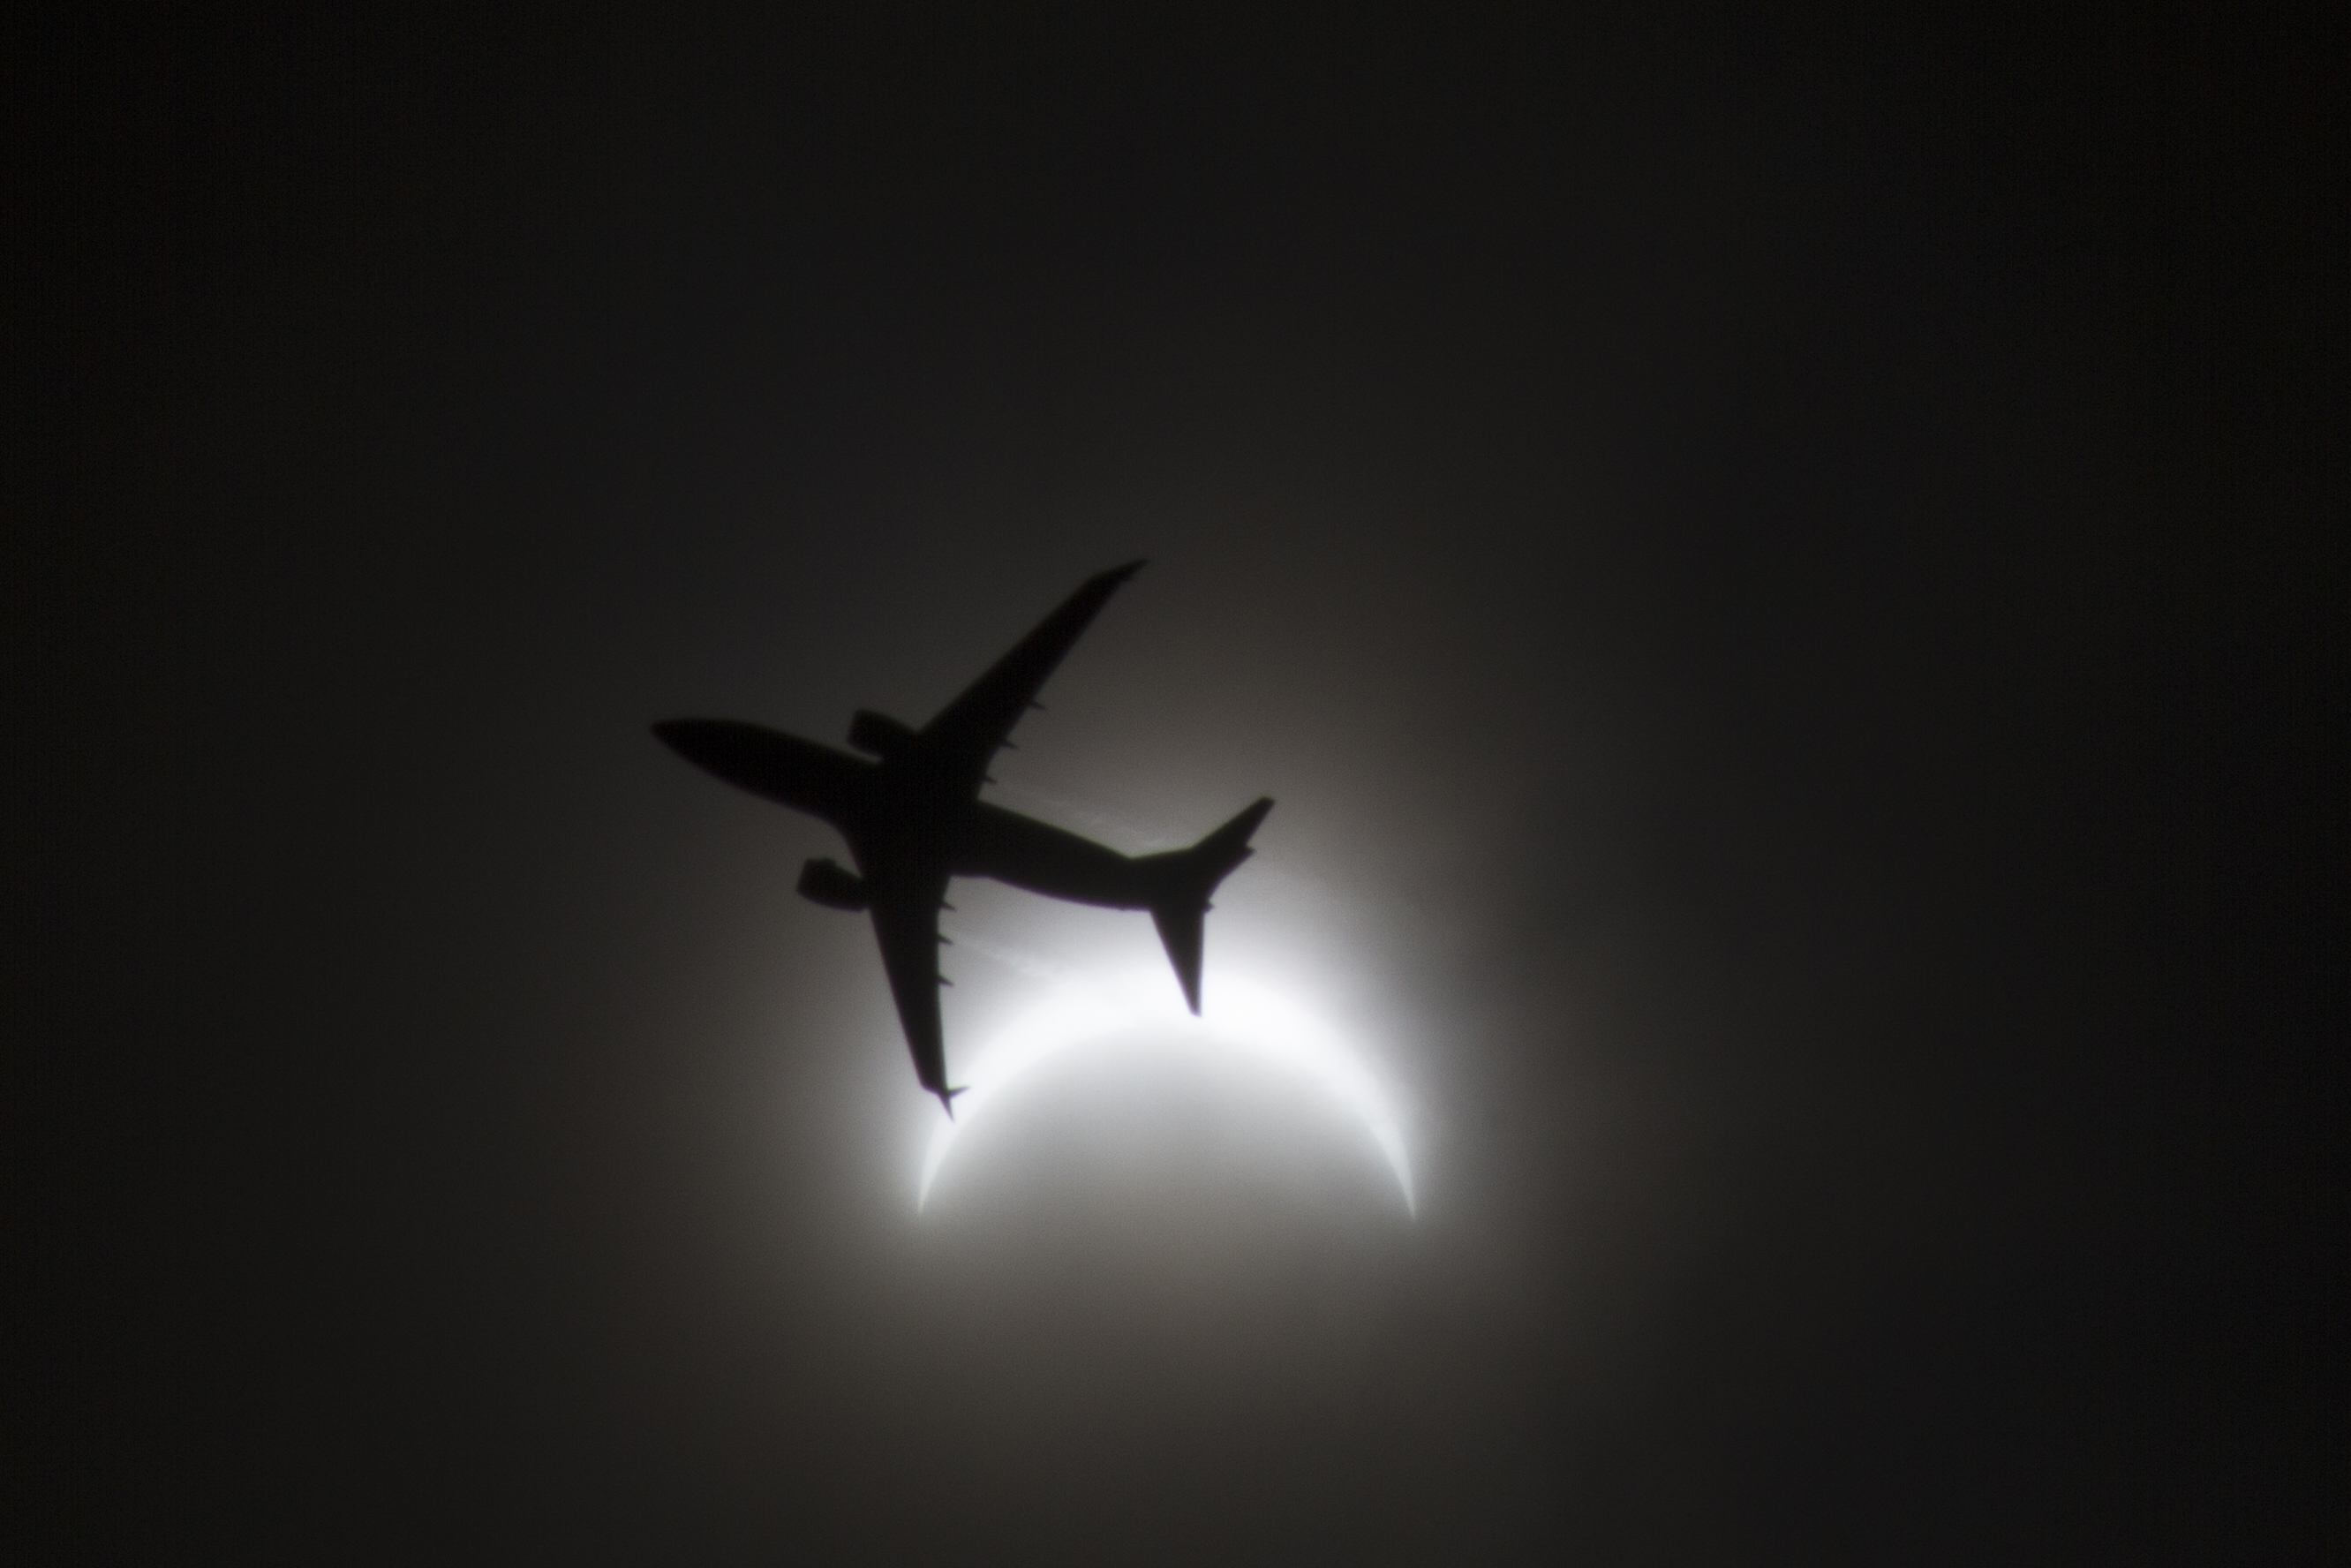 PlaneEclipse